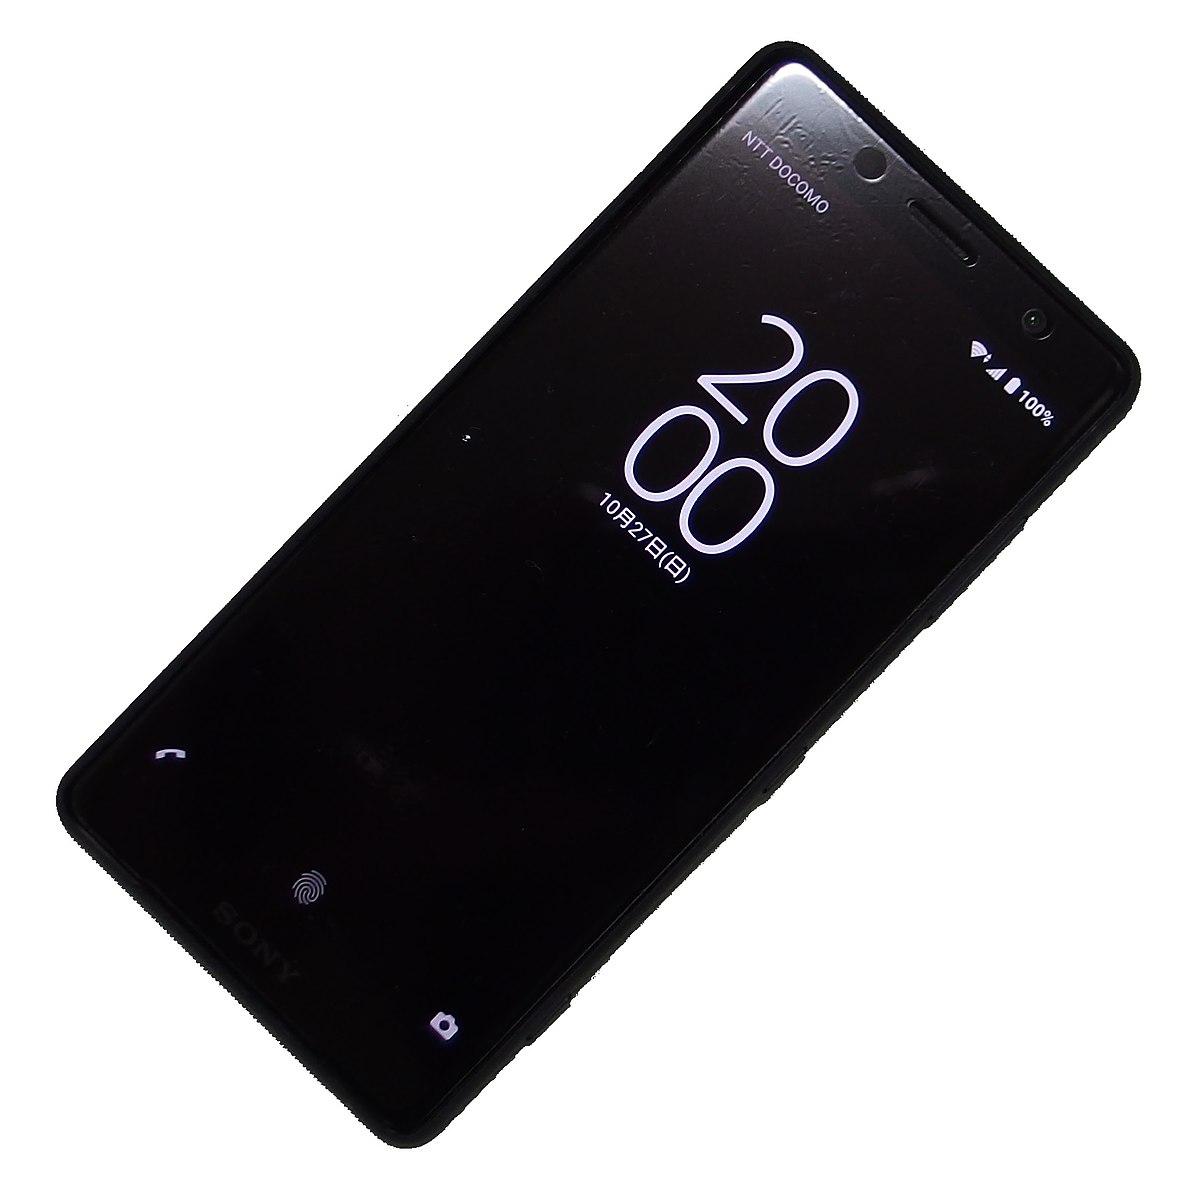 Sony Xperia Xz2 Compact Wikipedia